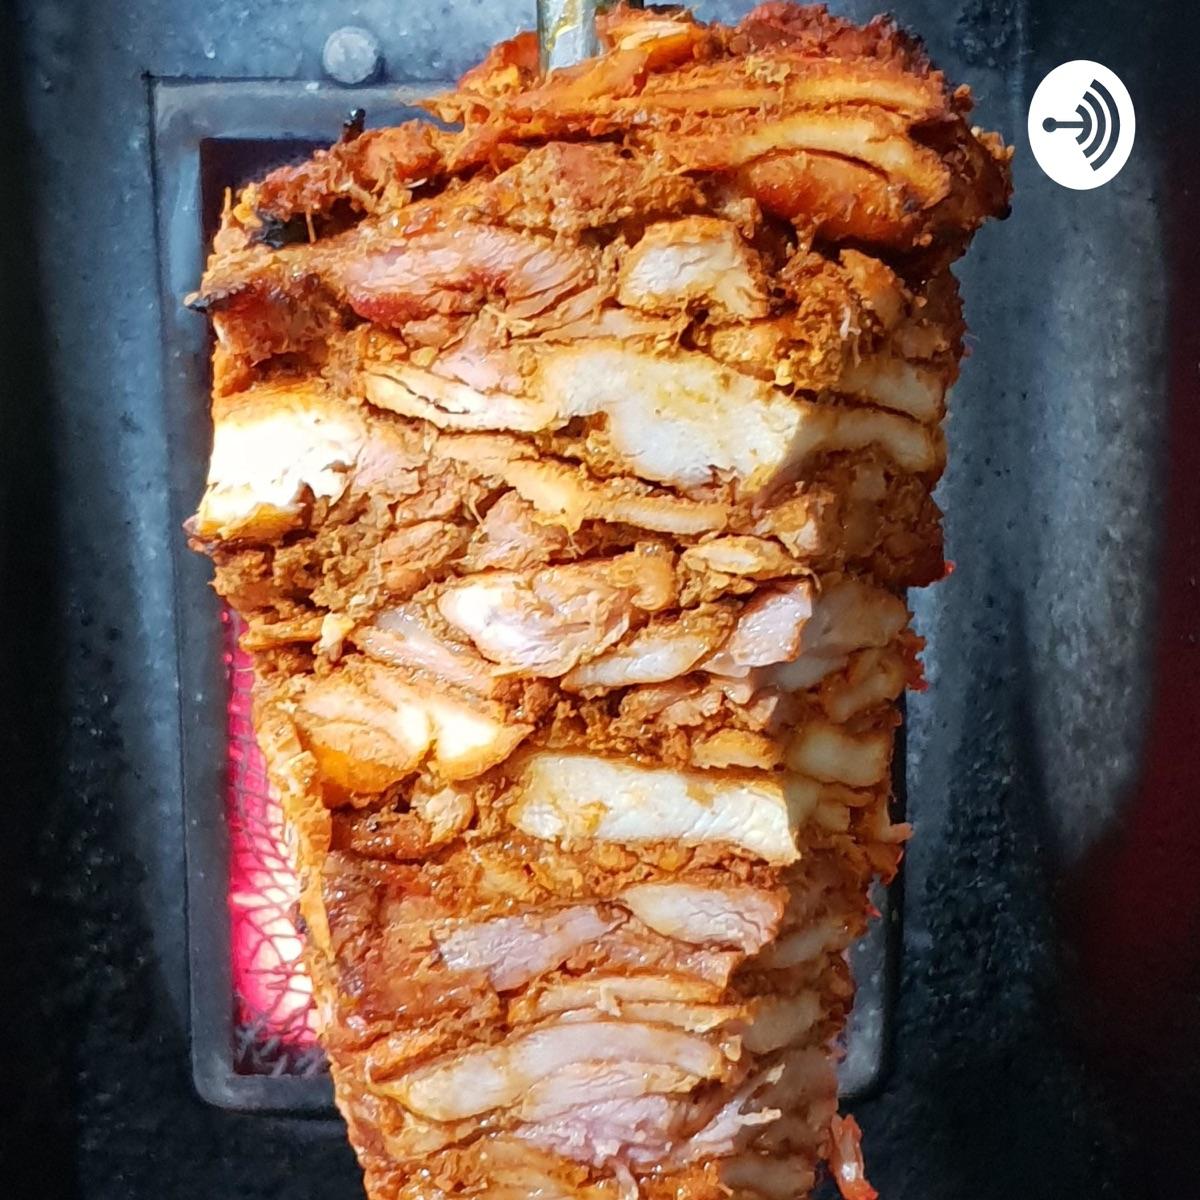 The Massive Kebab